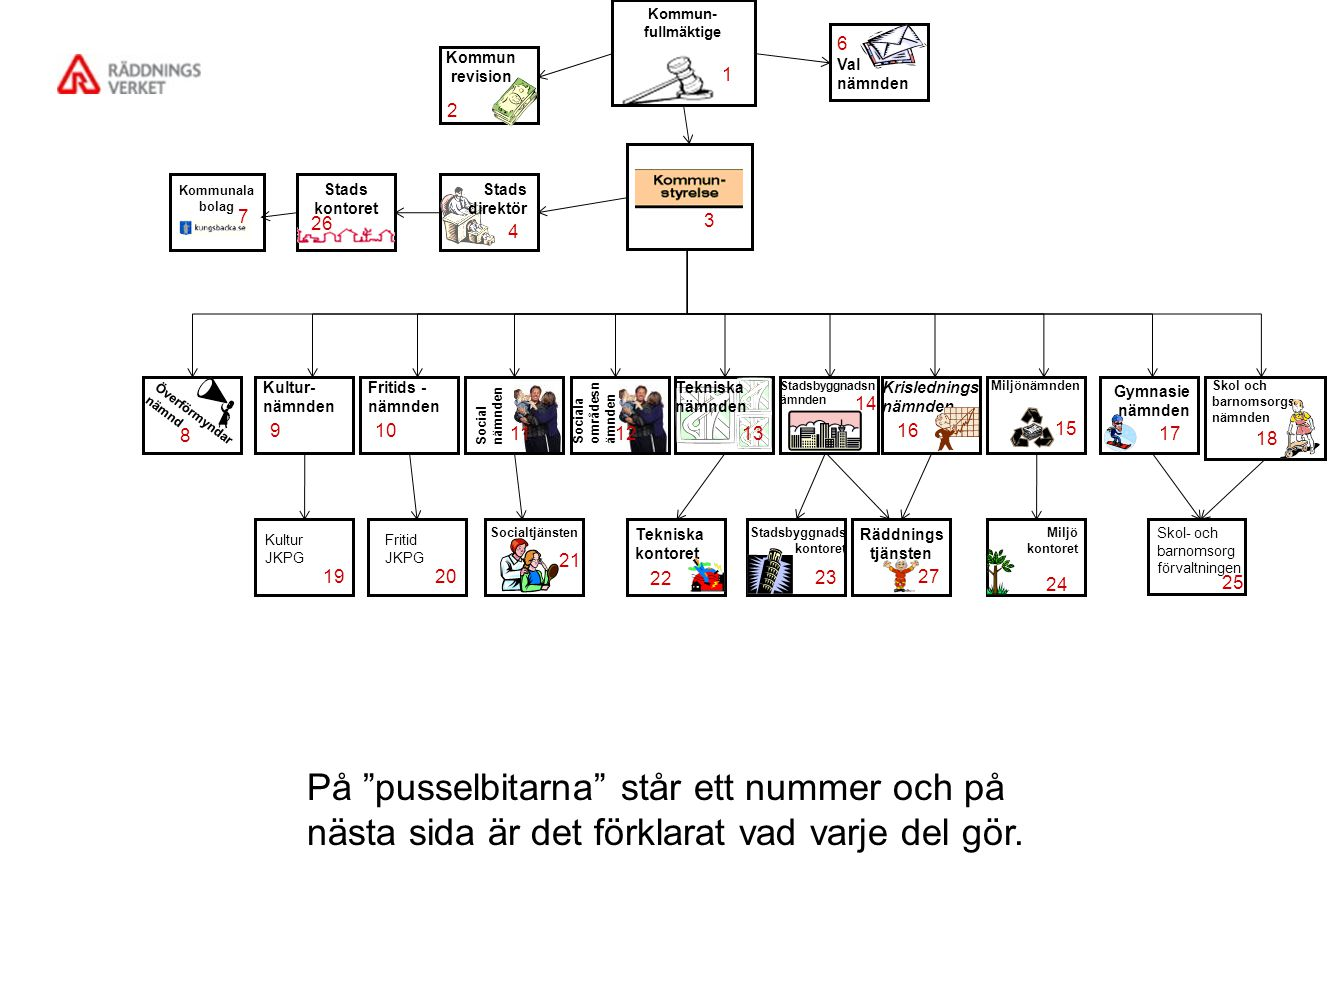 Kommun- fullmäktige 1. Val nämnden. 6. Kommunrevision. 2. 3. Kommunala bolag. 7. Stads kontoret.